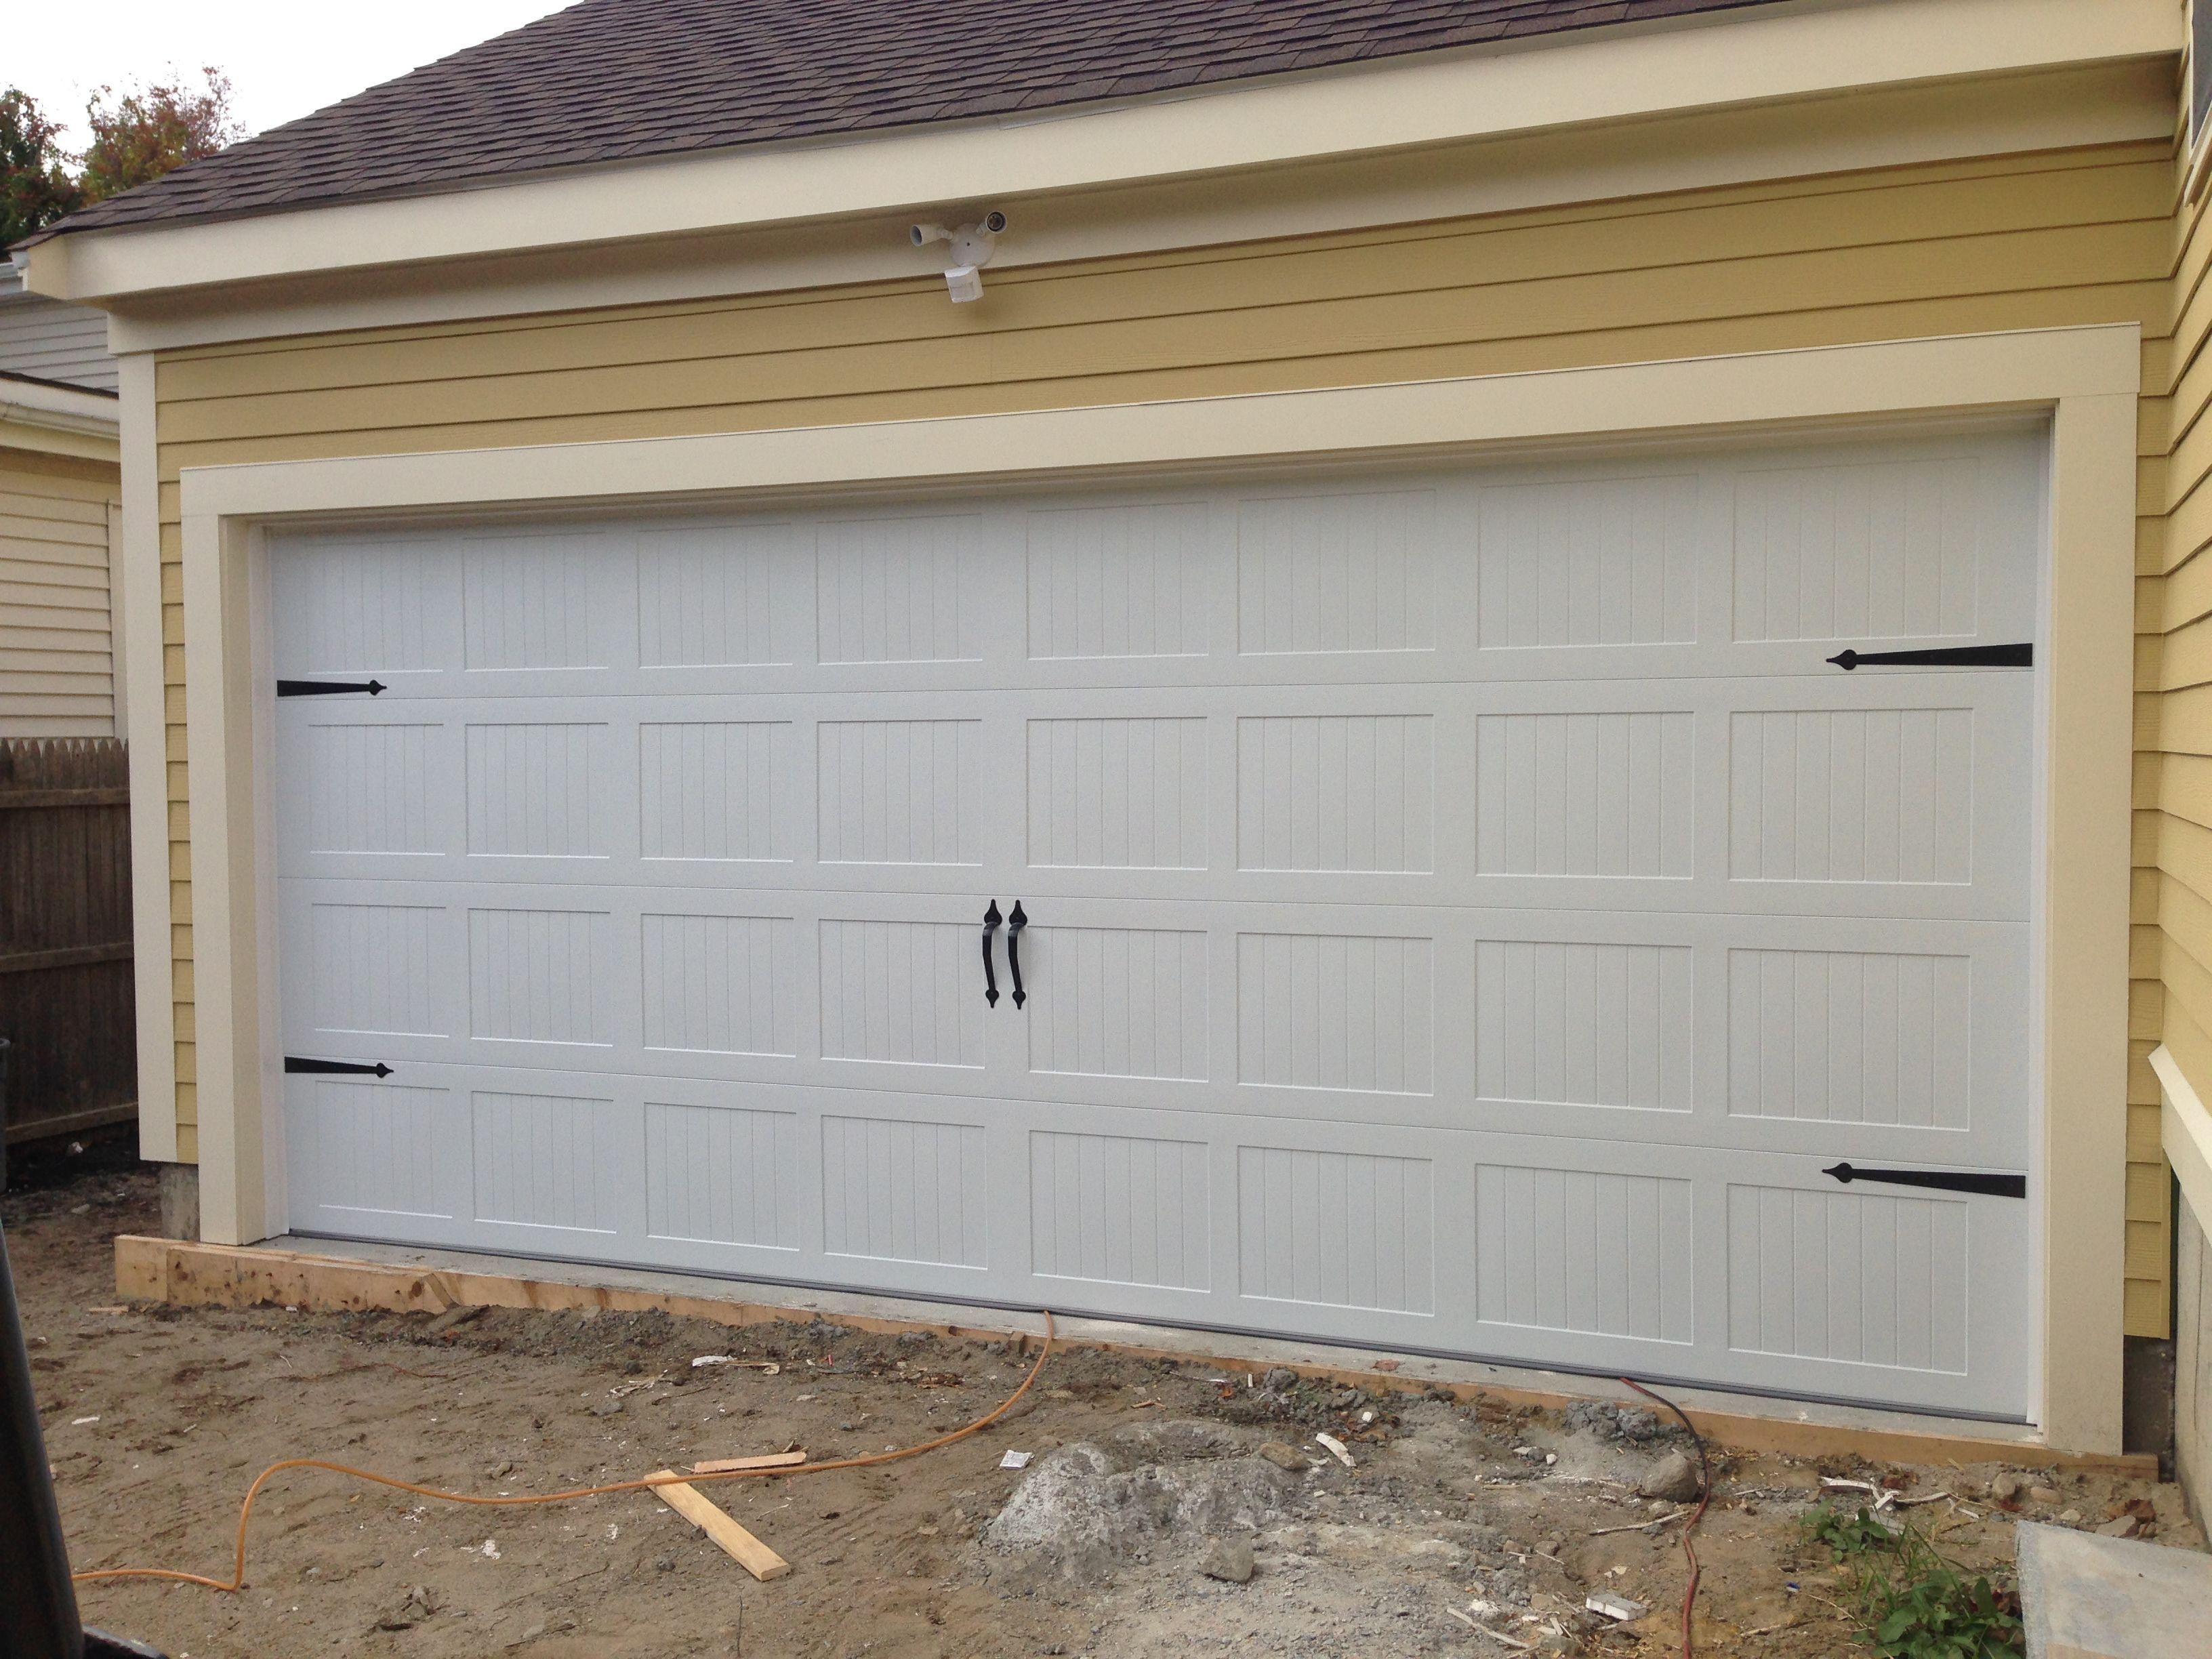 c h i overhead doors model 5283 steel carriage house style garage door in white with flat